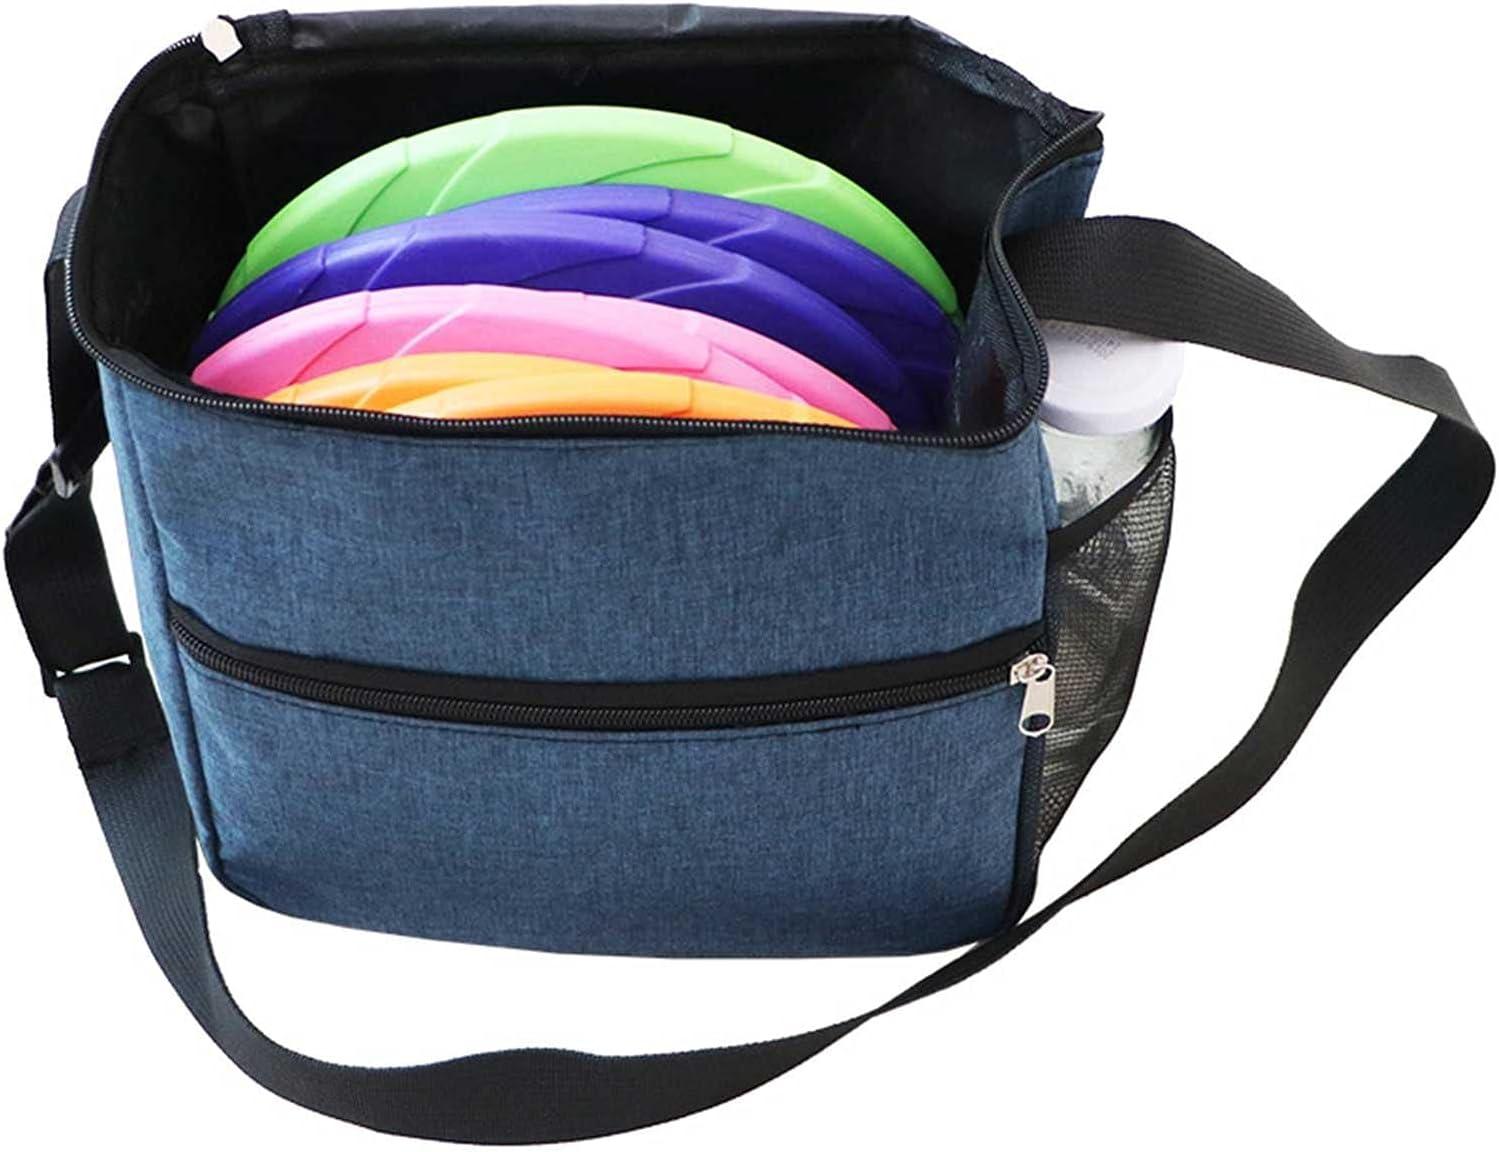 jiota El Paso Mall Weekender Disc Golf Bag Durable 10 Max 46% OFF with Capa